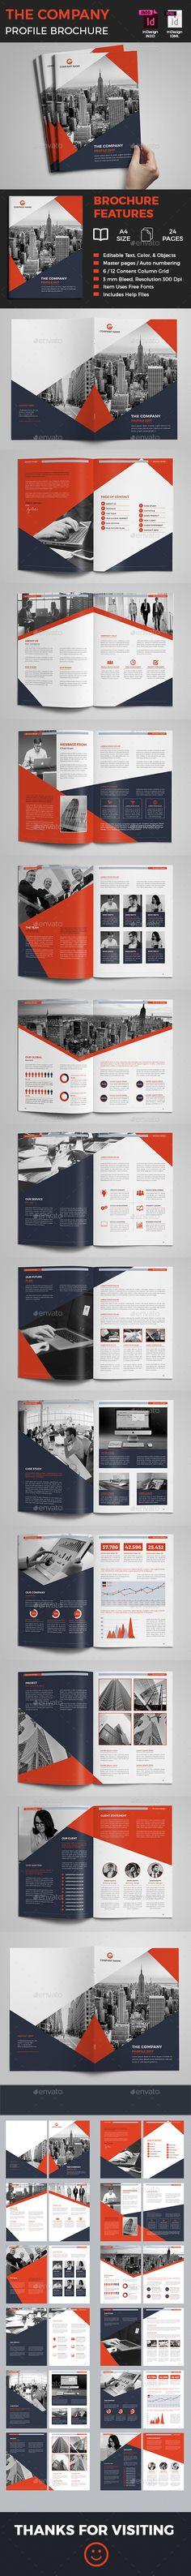 Company Profile - Corporate Brochures Download here : https://graphicriver.net/item/company-profile/19479629?s_rank=15&ref=Al-fatih